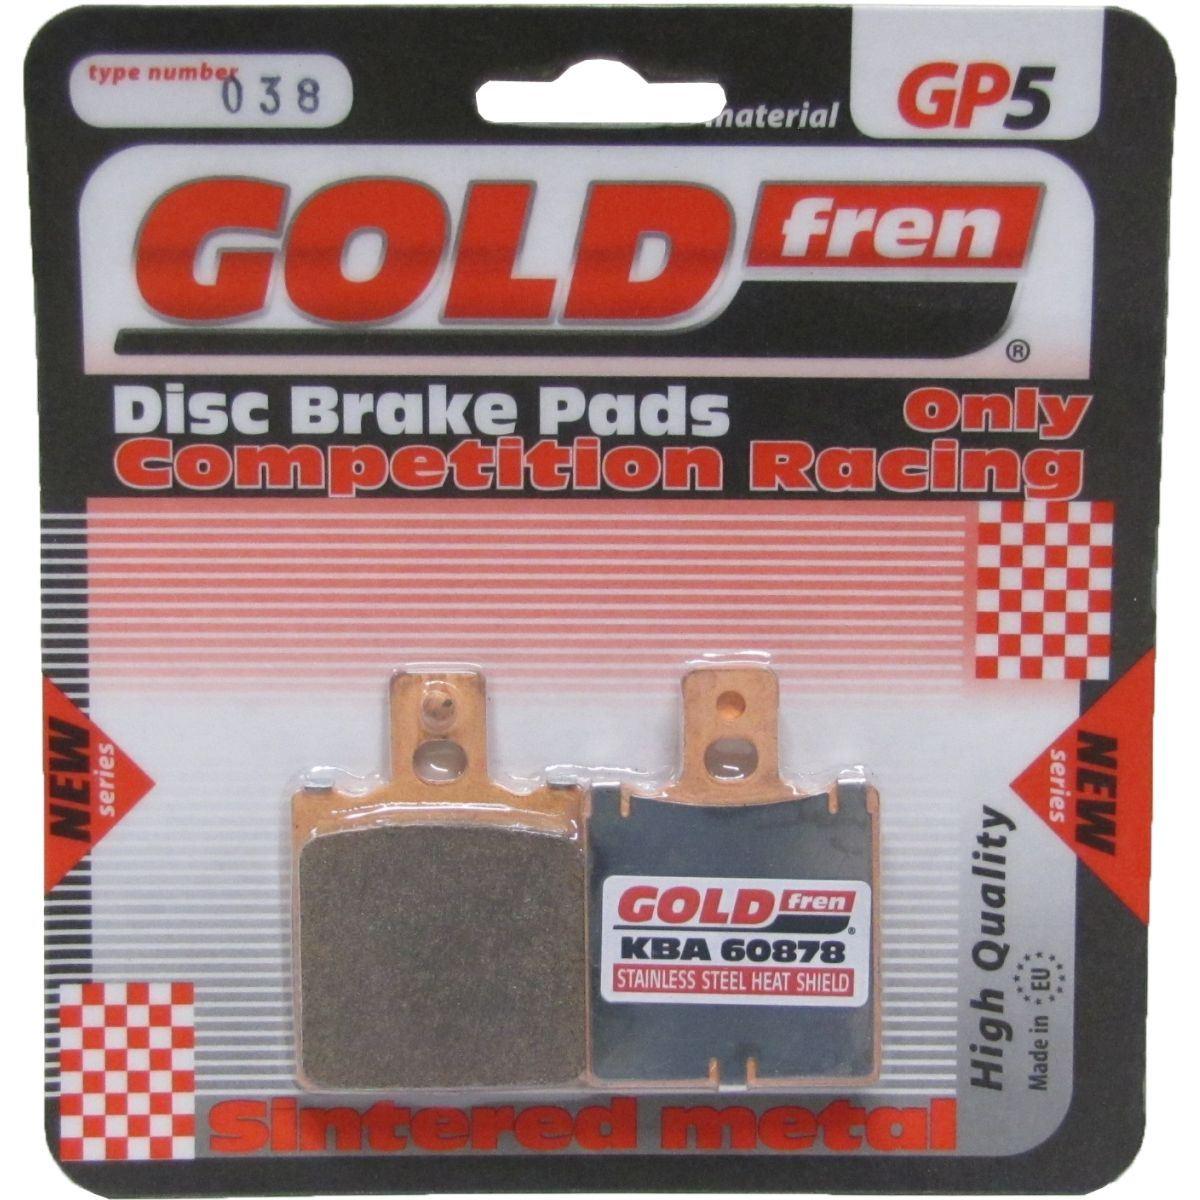 Goldfren GP5-038, VD911, VD948, FA47, FDB207/R, FDB705, SBS519 Disc Pads (Pair)